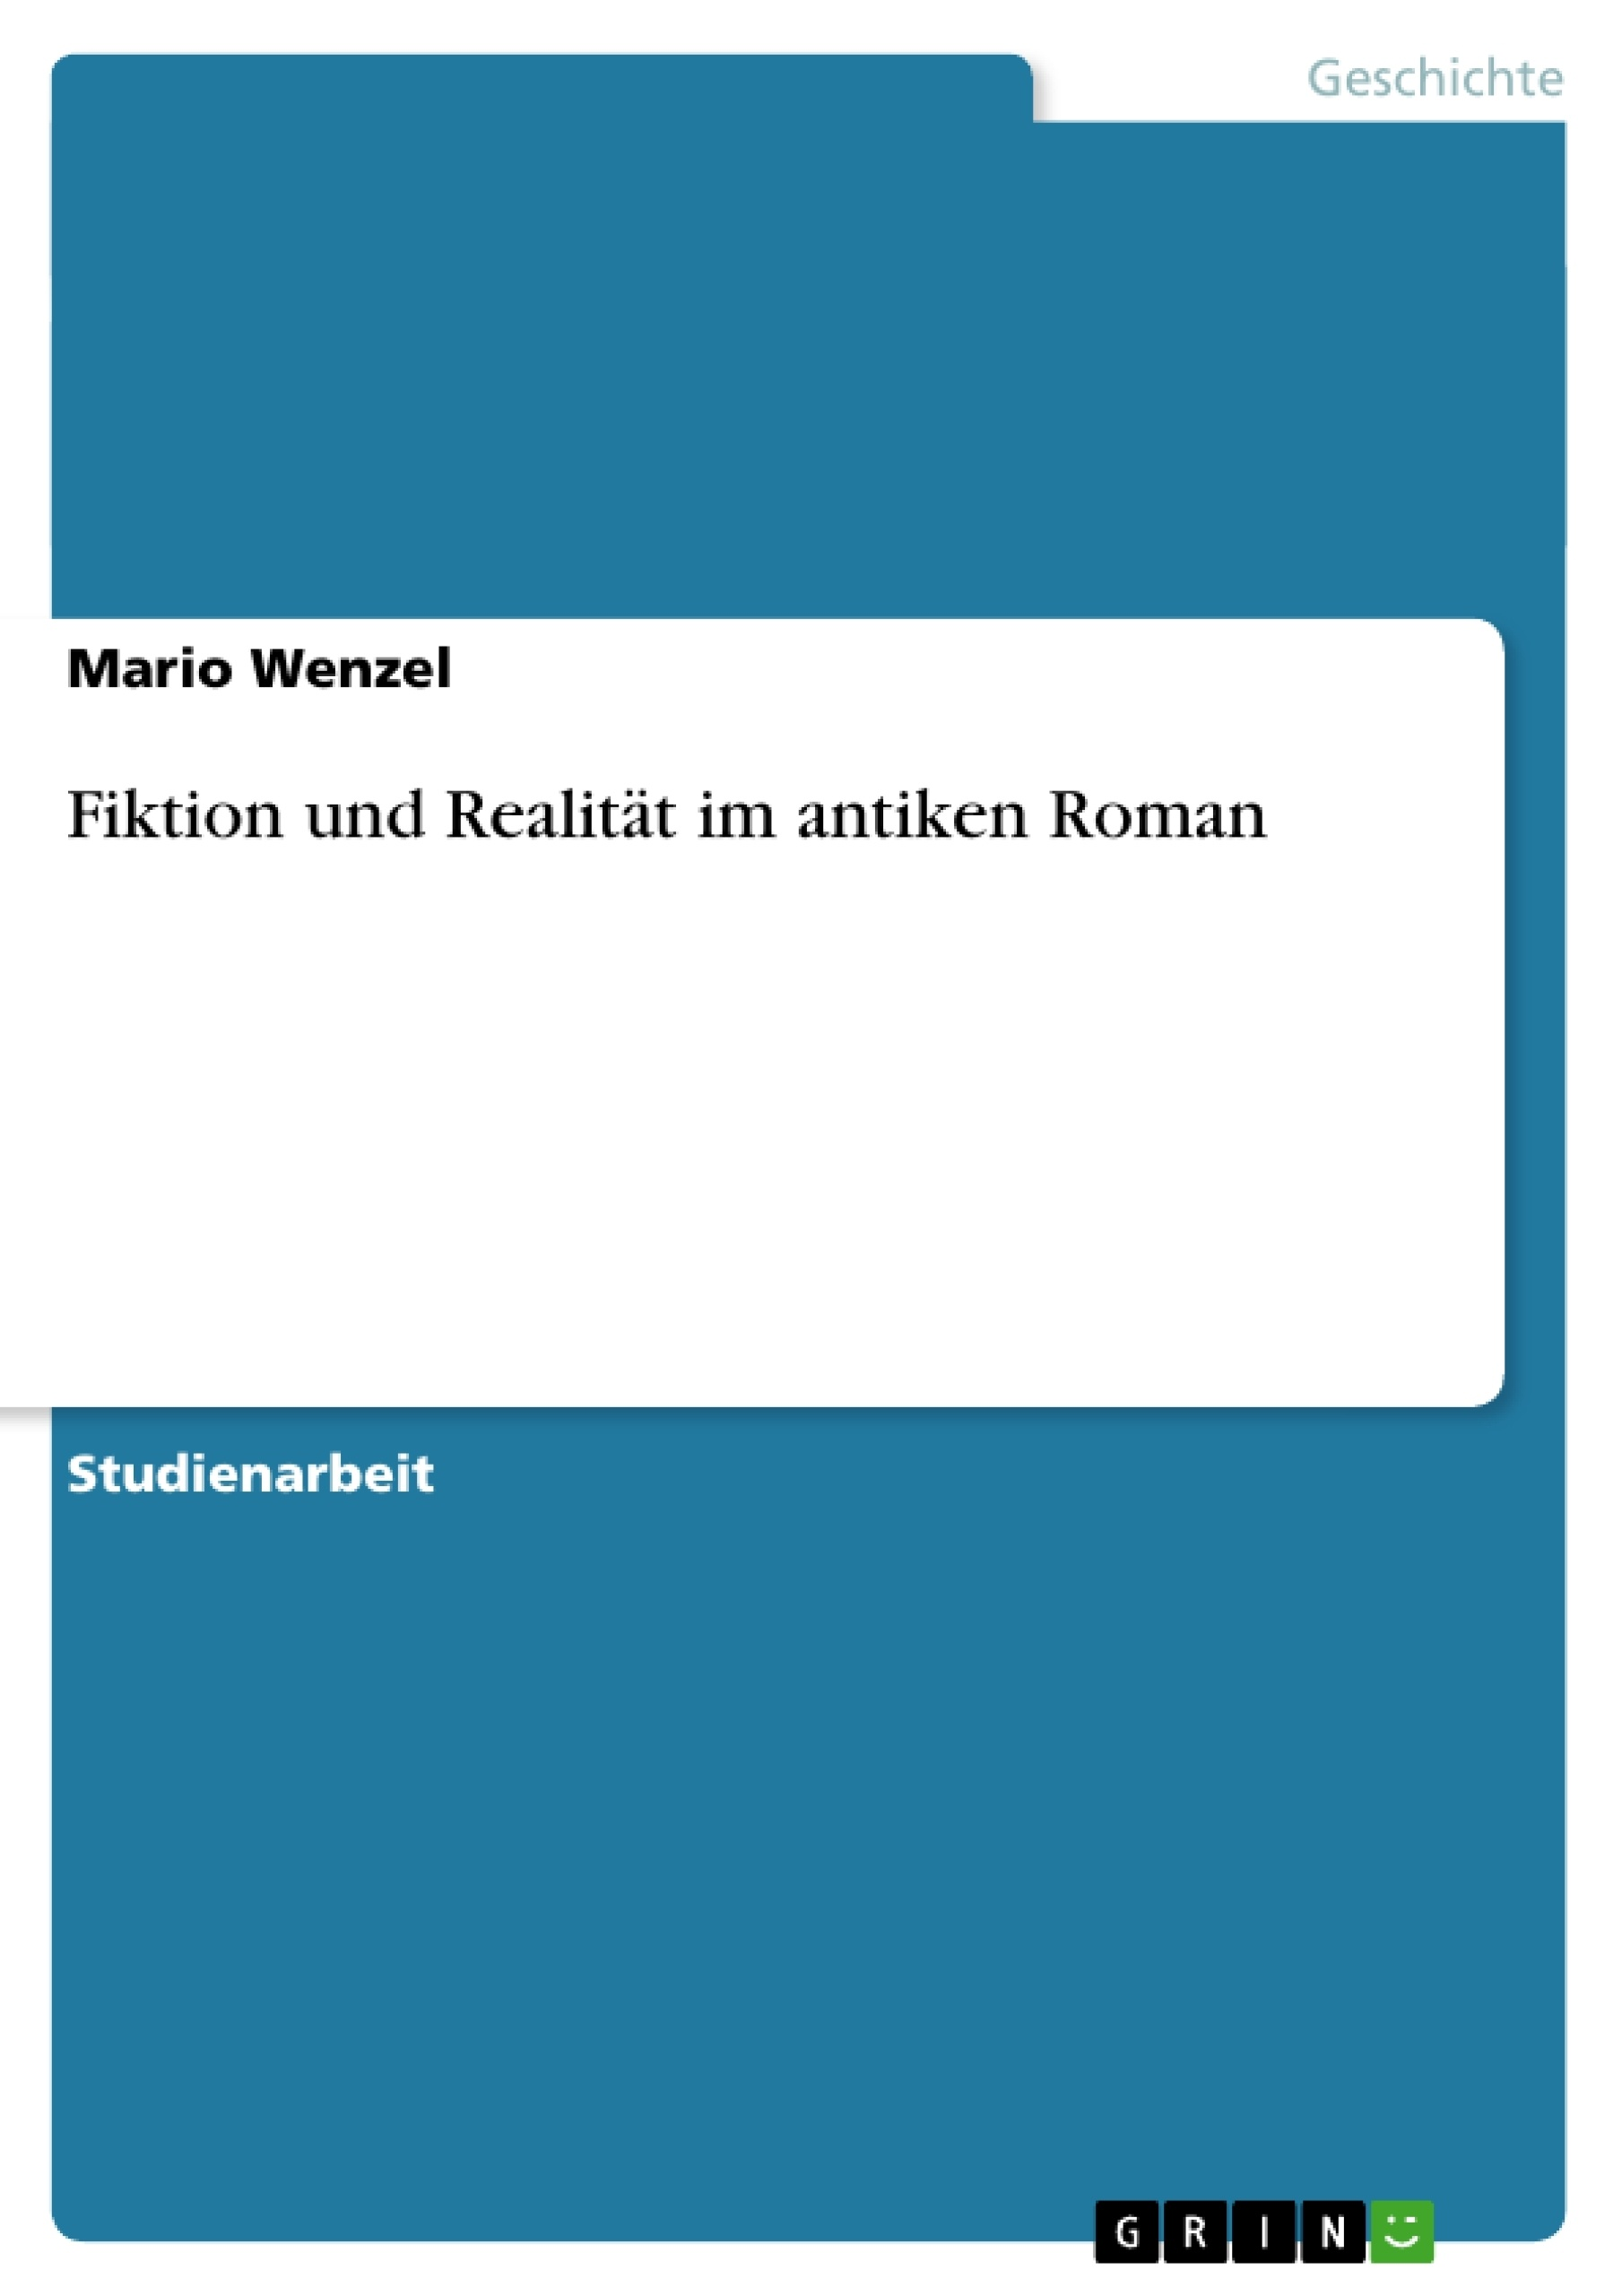 Titel: Fiktion und Realität im antiken Roman